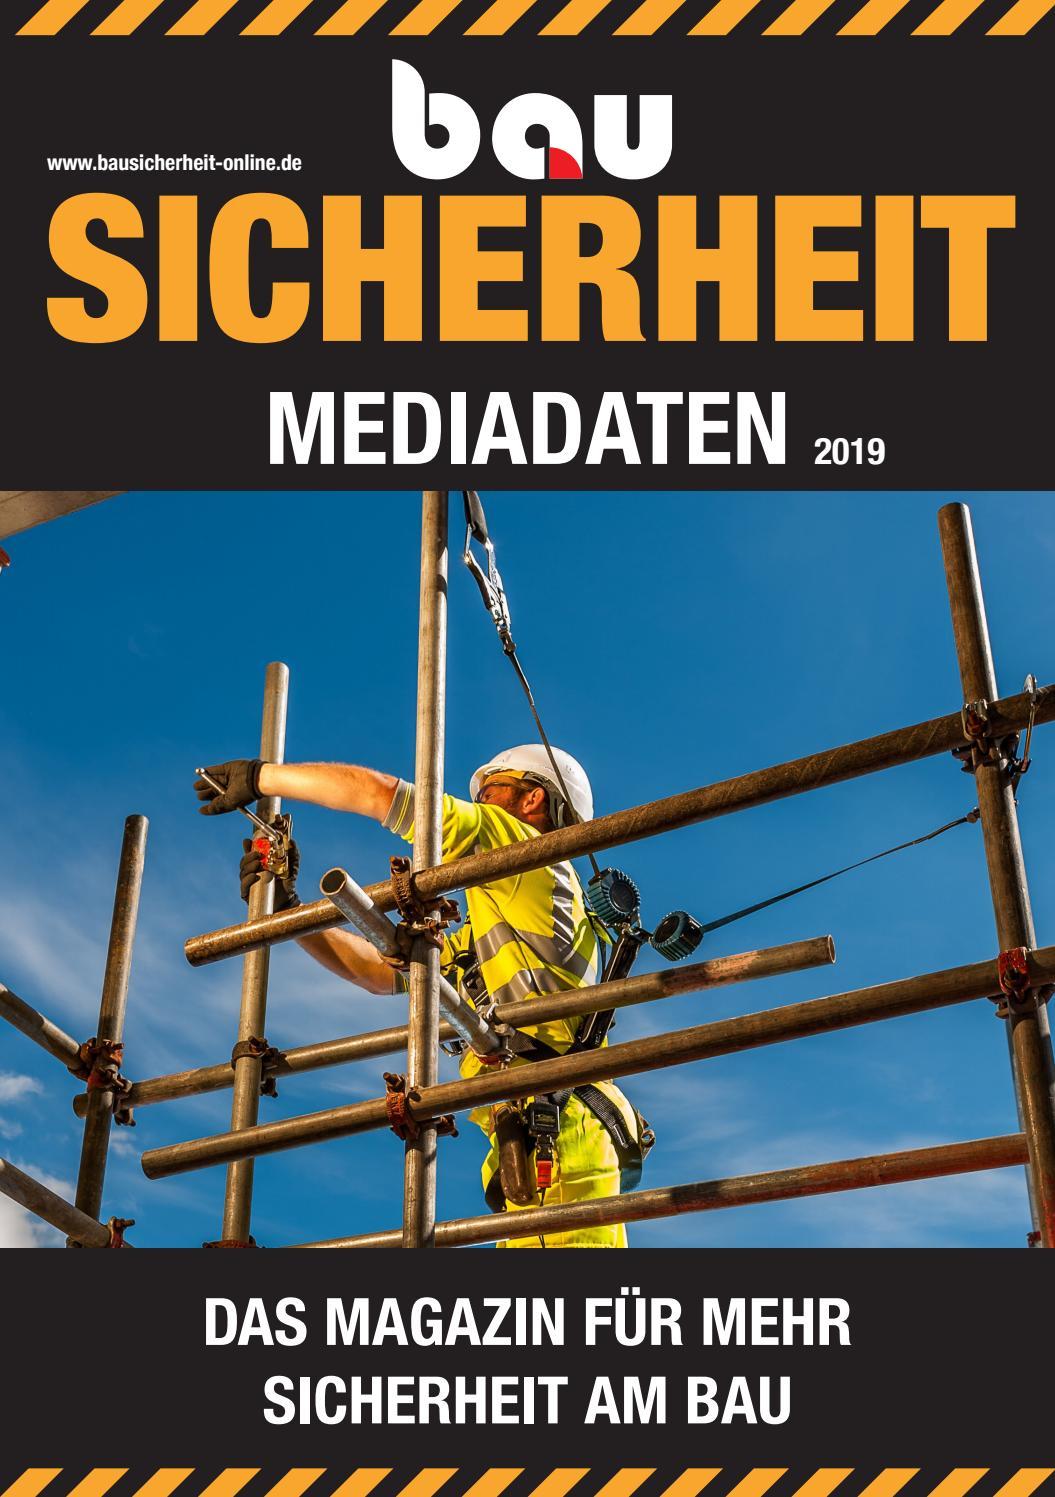 bauSICHERHEIT April 2019 by SBM Verlag GmbH issuu